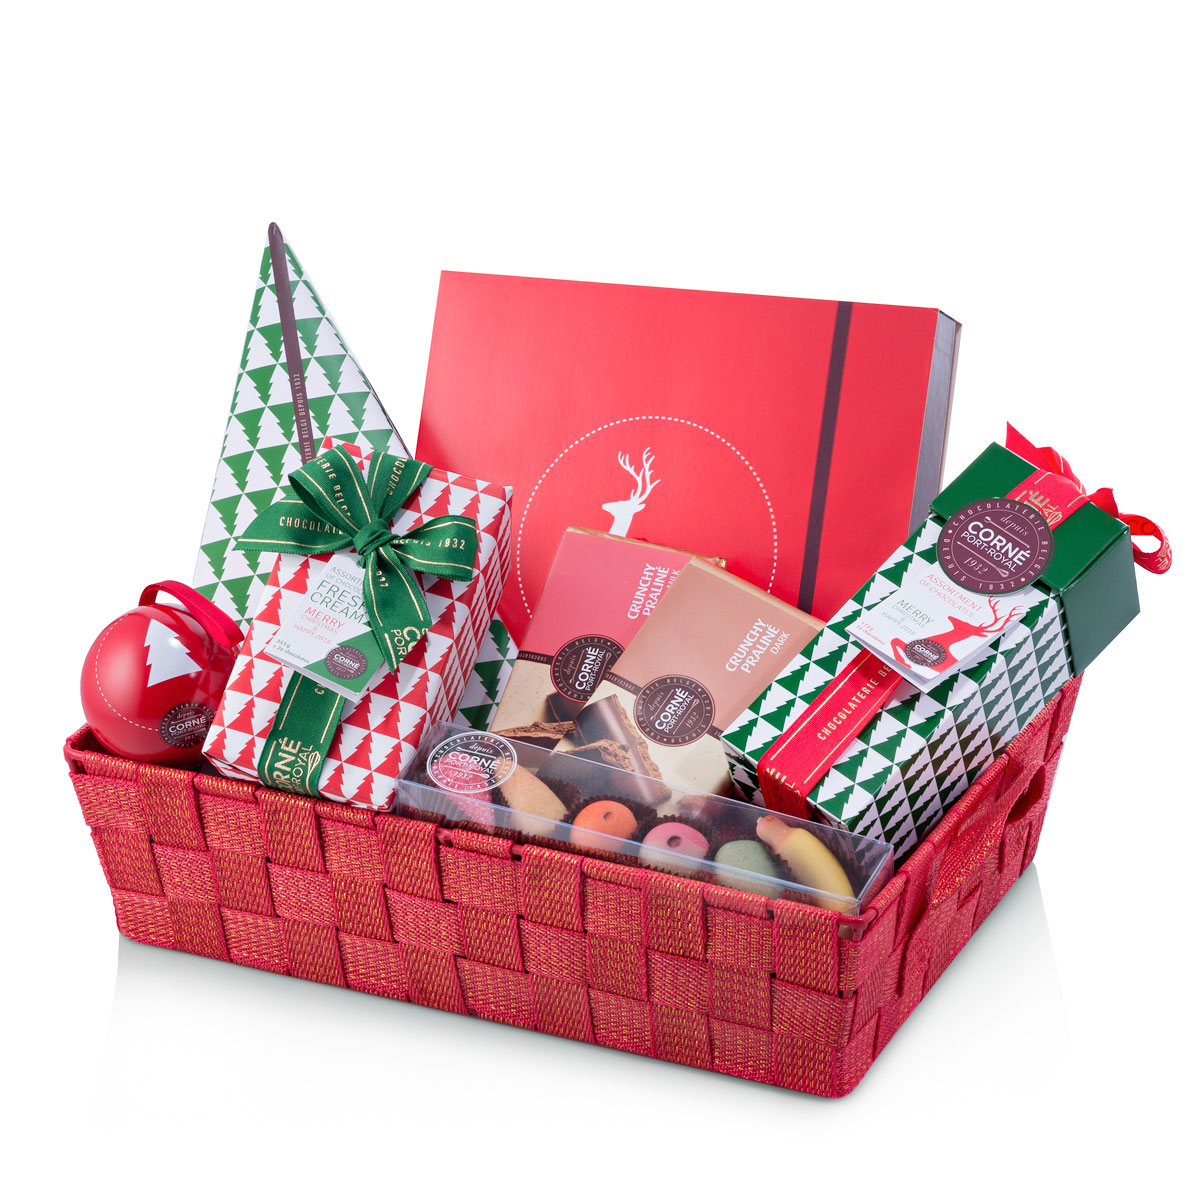 Panier Cadeau Provence : Corn? port royal panier cadeau chocolats no?l cadofrance